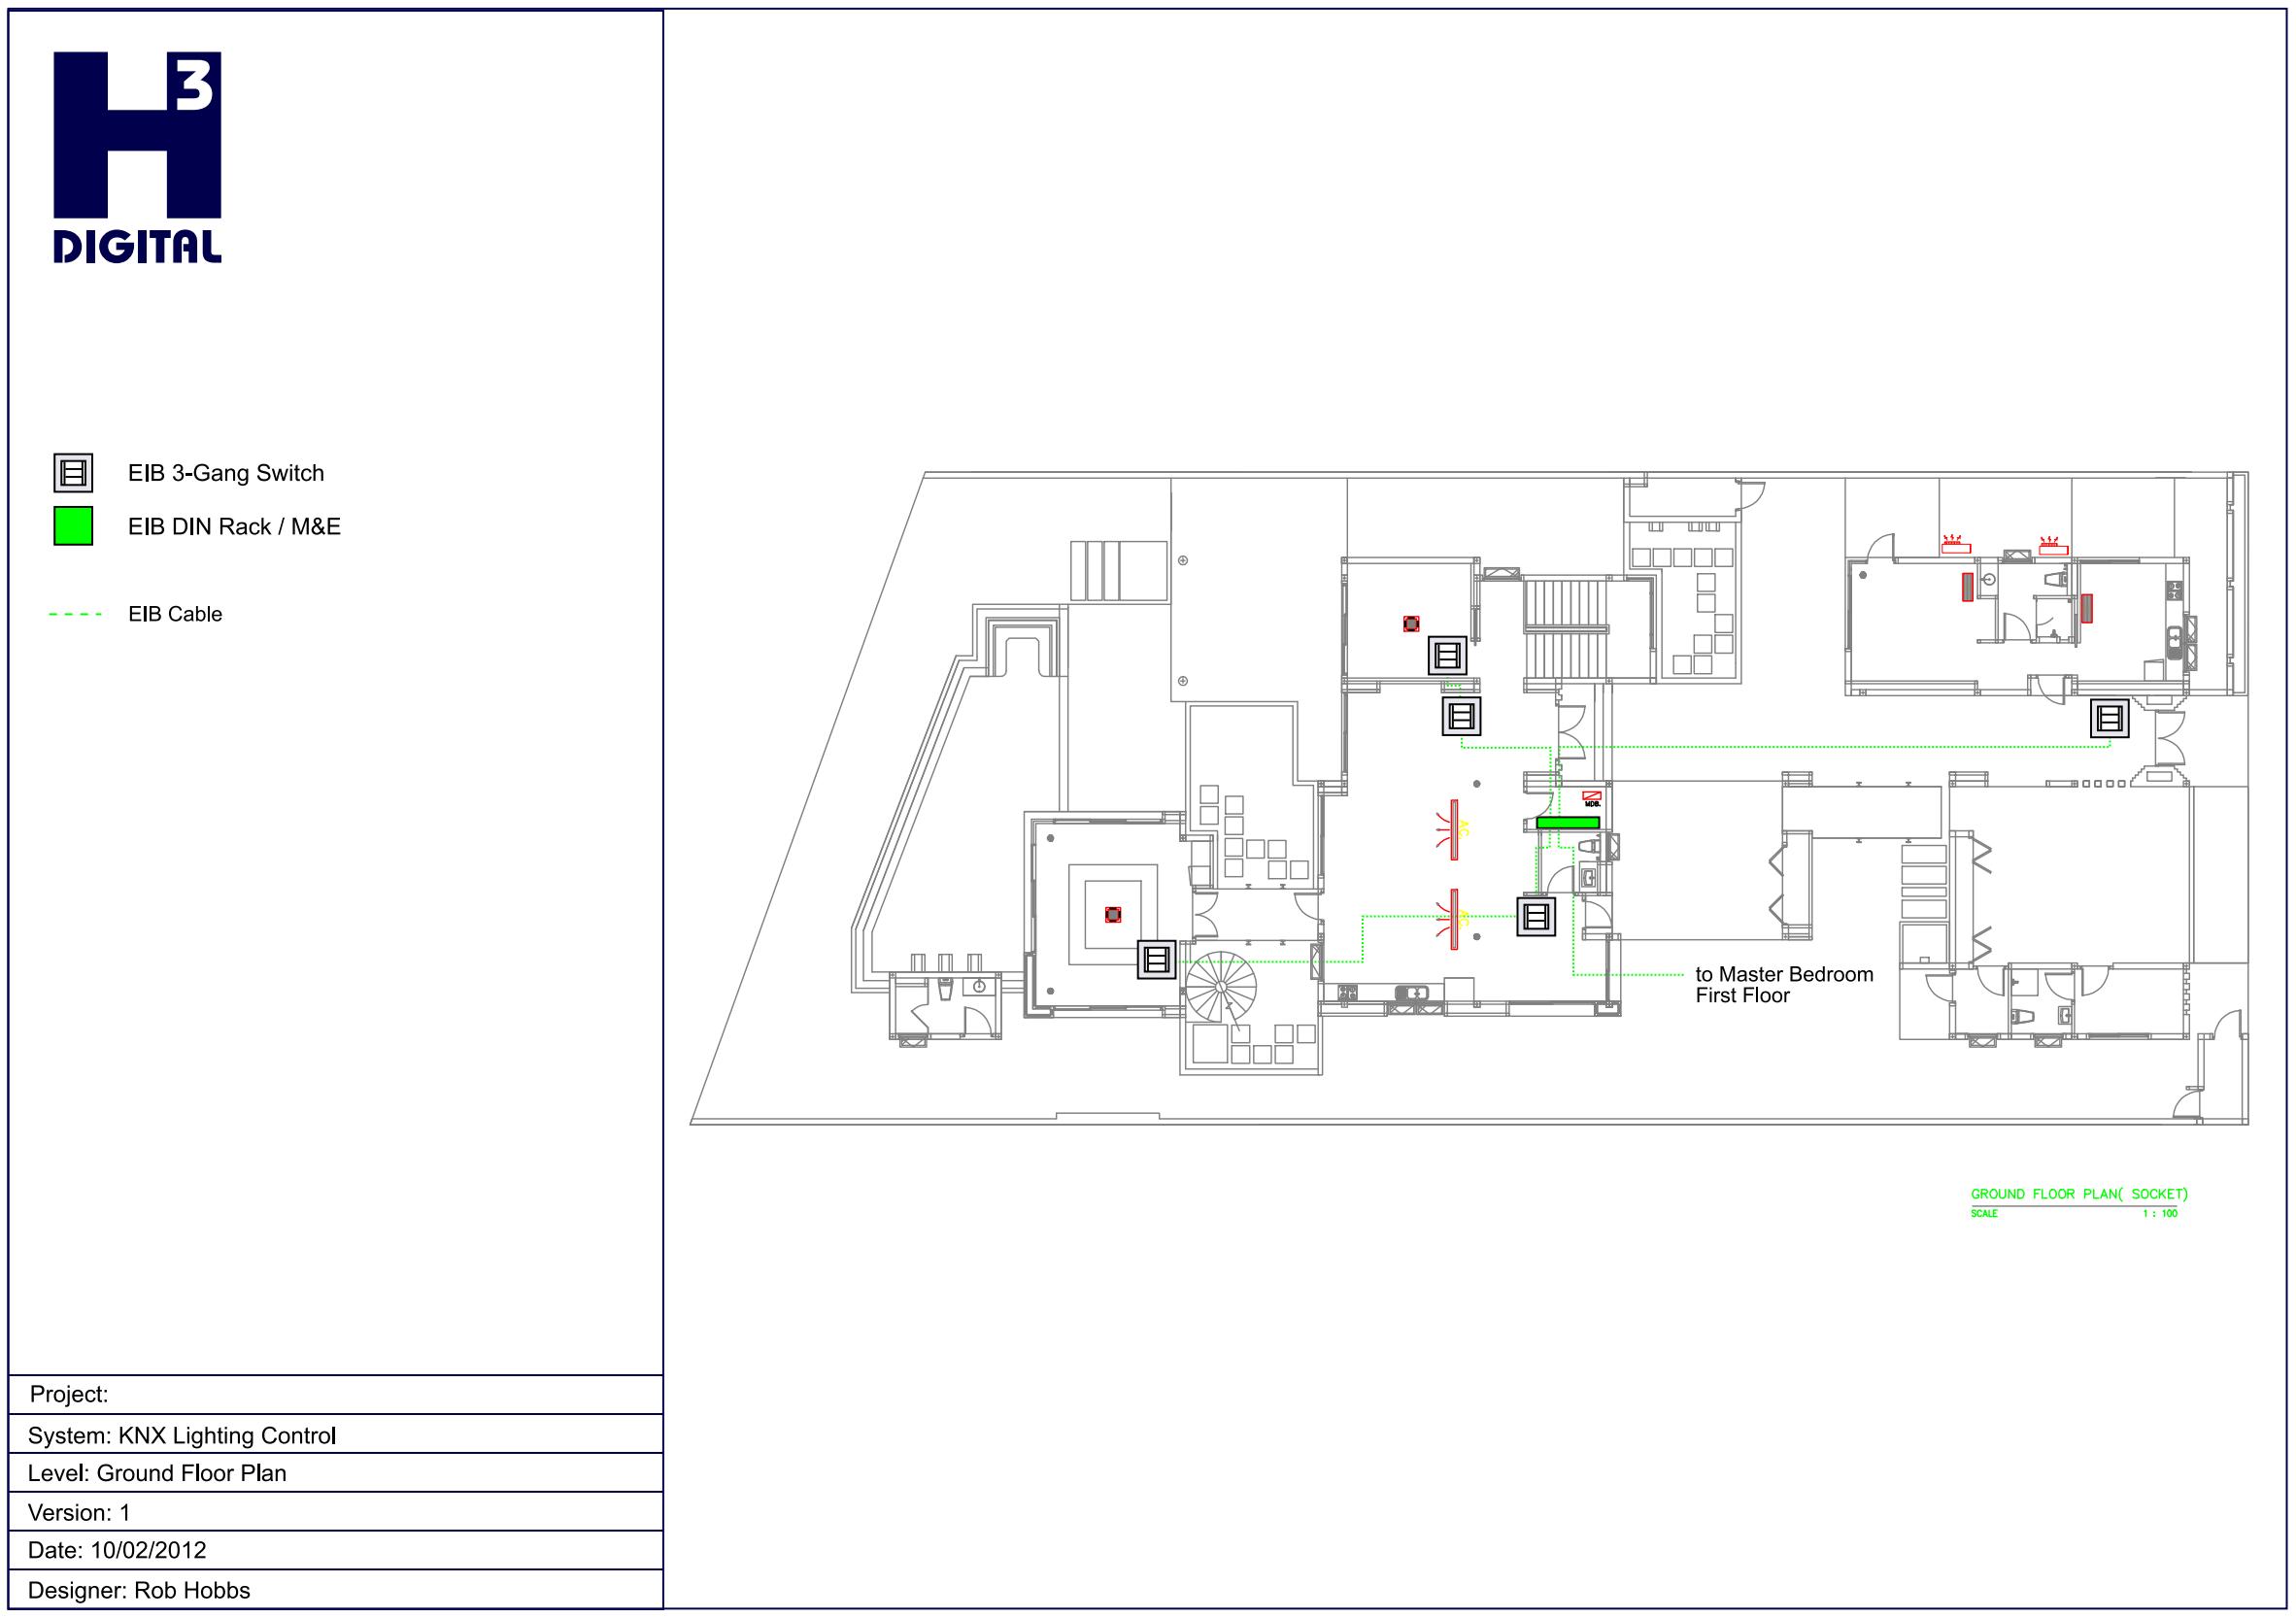 Example - Common Area Lighting control - Lower Level